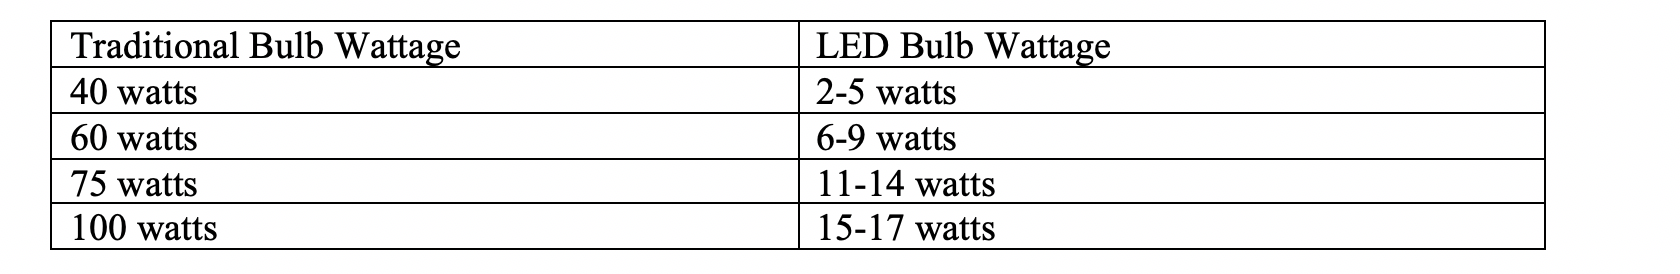 light-bulb-wattage-chart.png